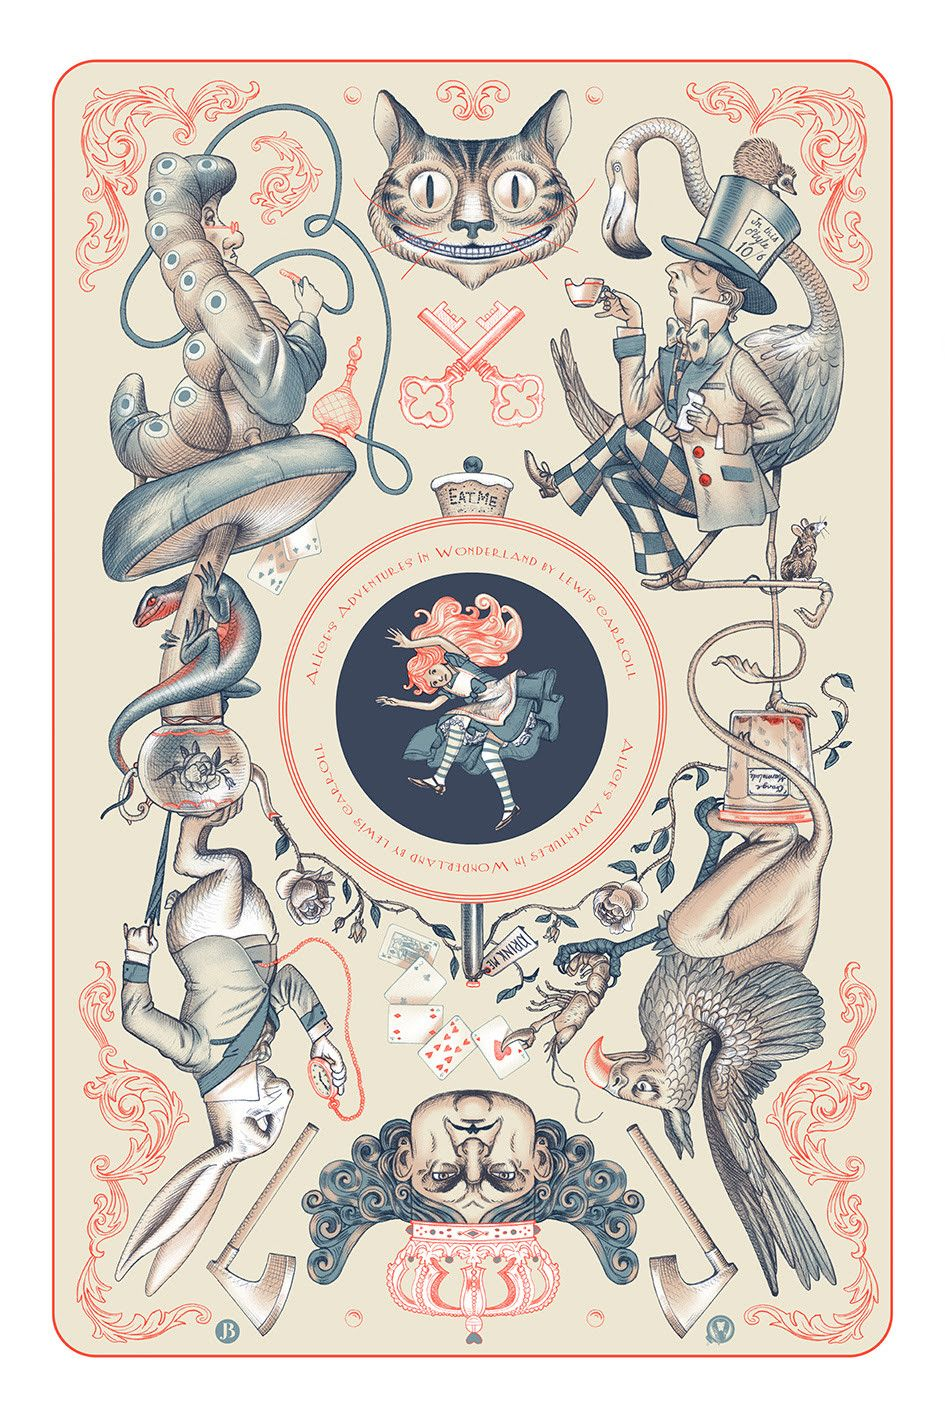 Aliceus adventures in wonderland limited edition prints number